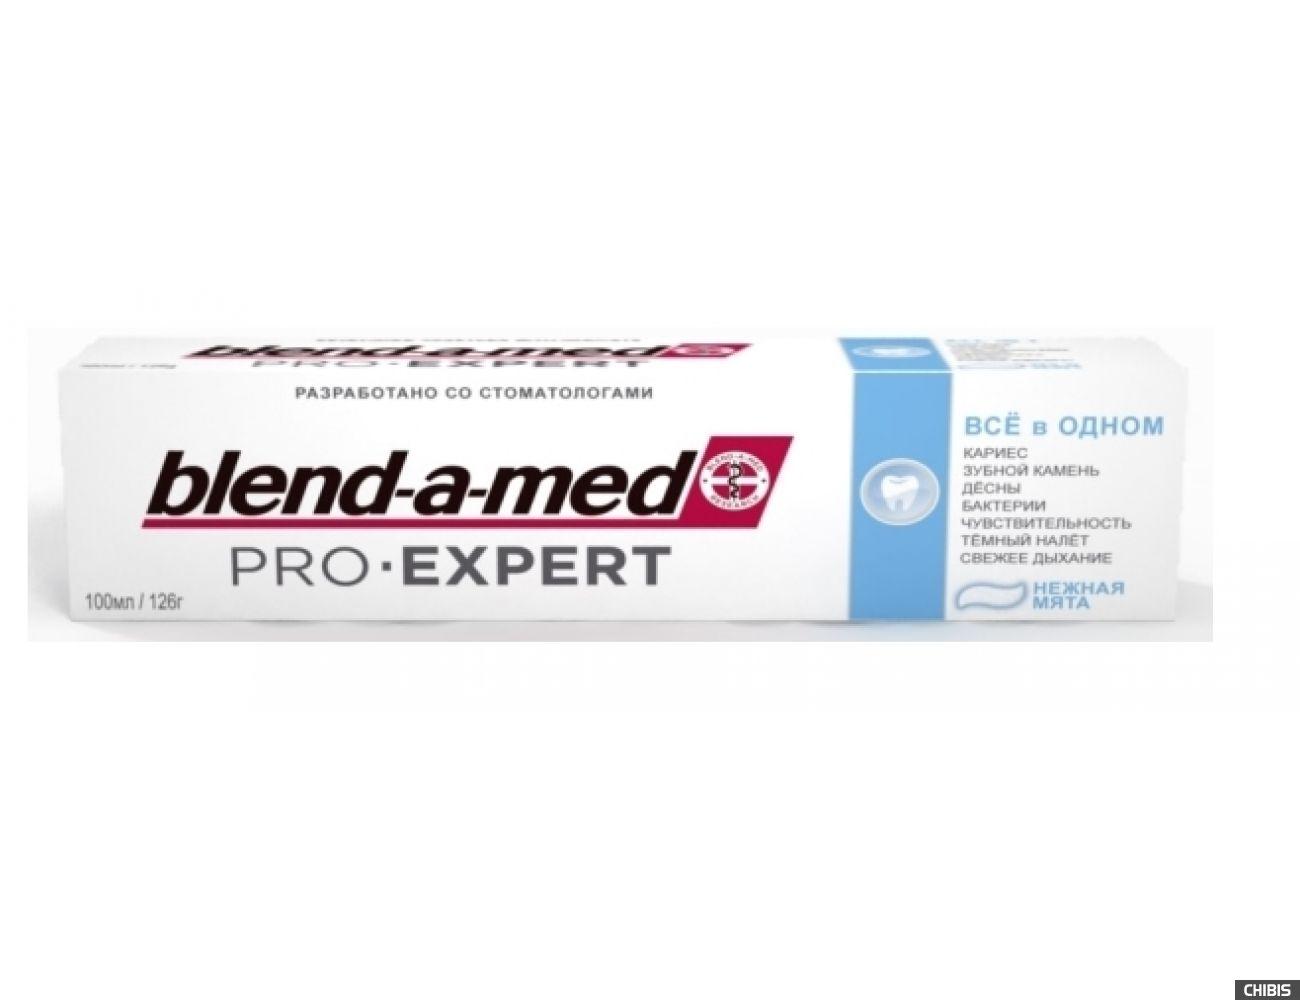 Зубная паста Blend-a-med Pro-Expert Все в одном Нежная Мята 100 мл.(5013965578519)